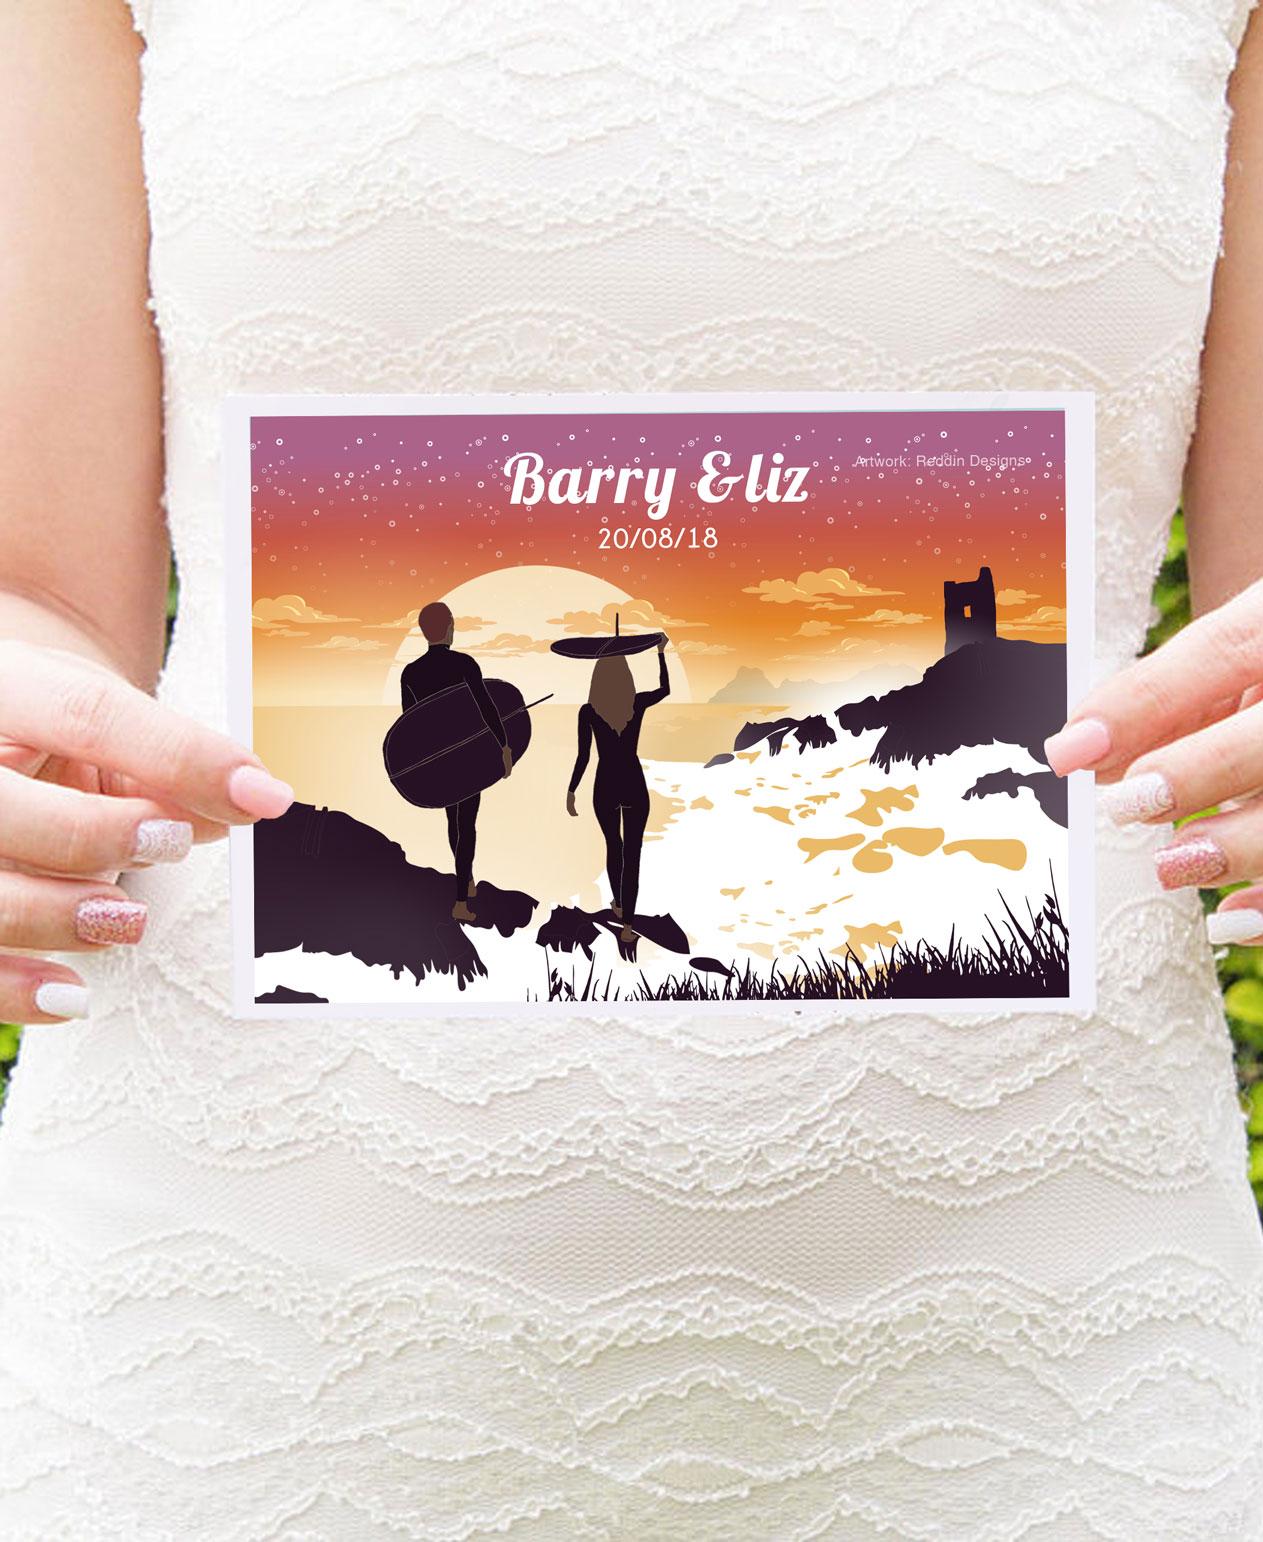 Reddin-designs-wedding-invites-couple-surfing-ireland.jpg